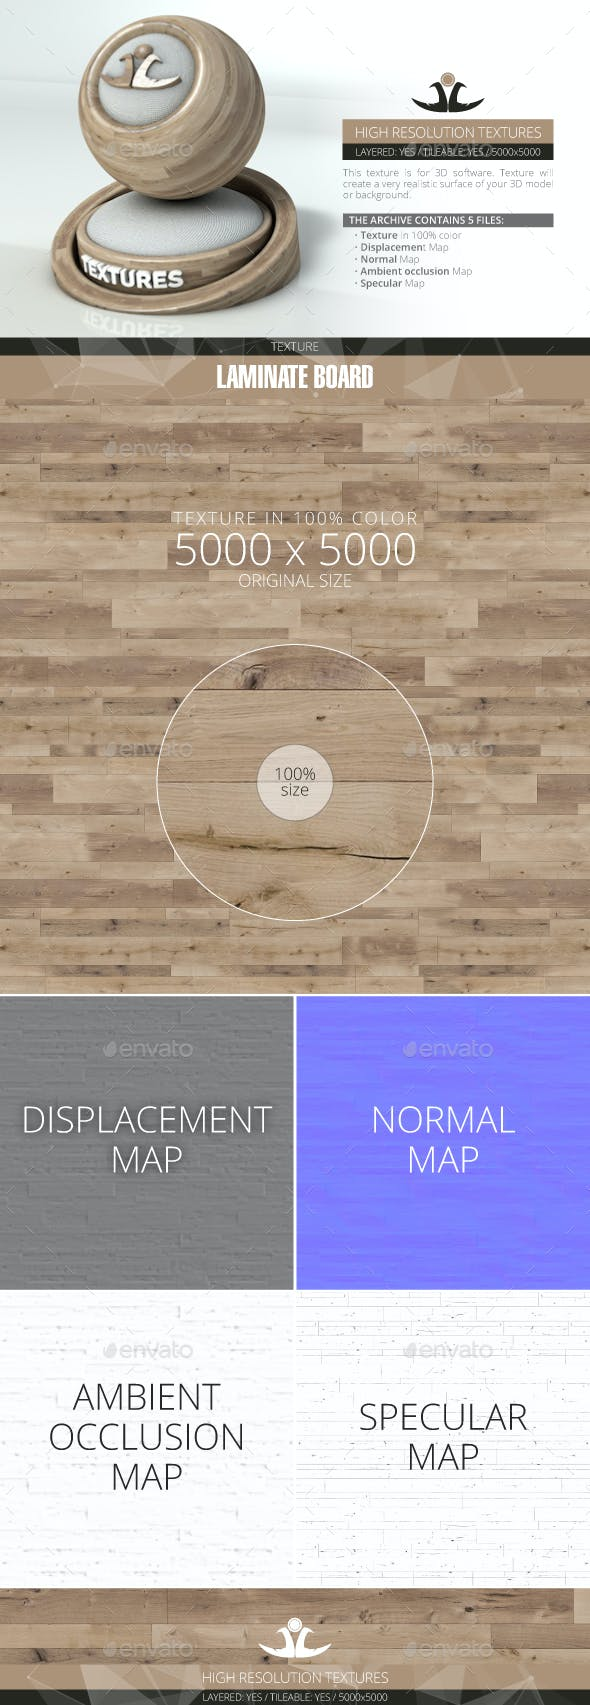 Laminate Board 85 - 3DOcean Item for Sale